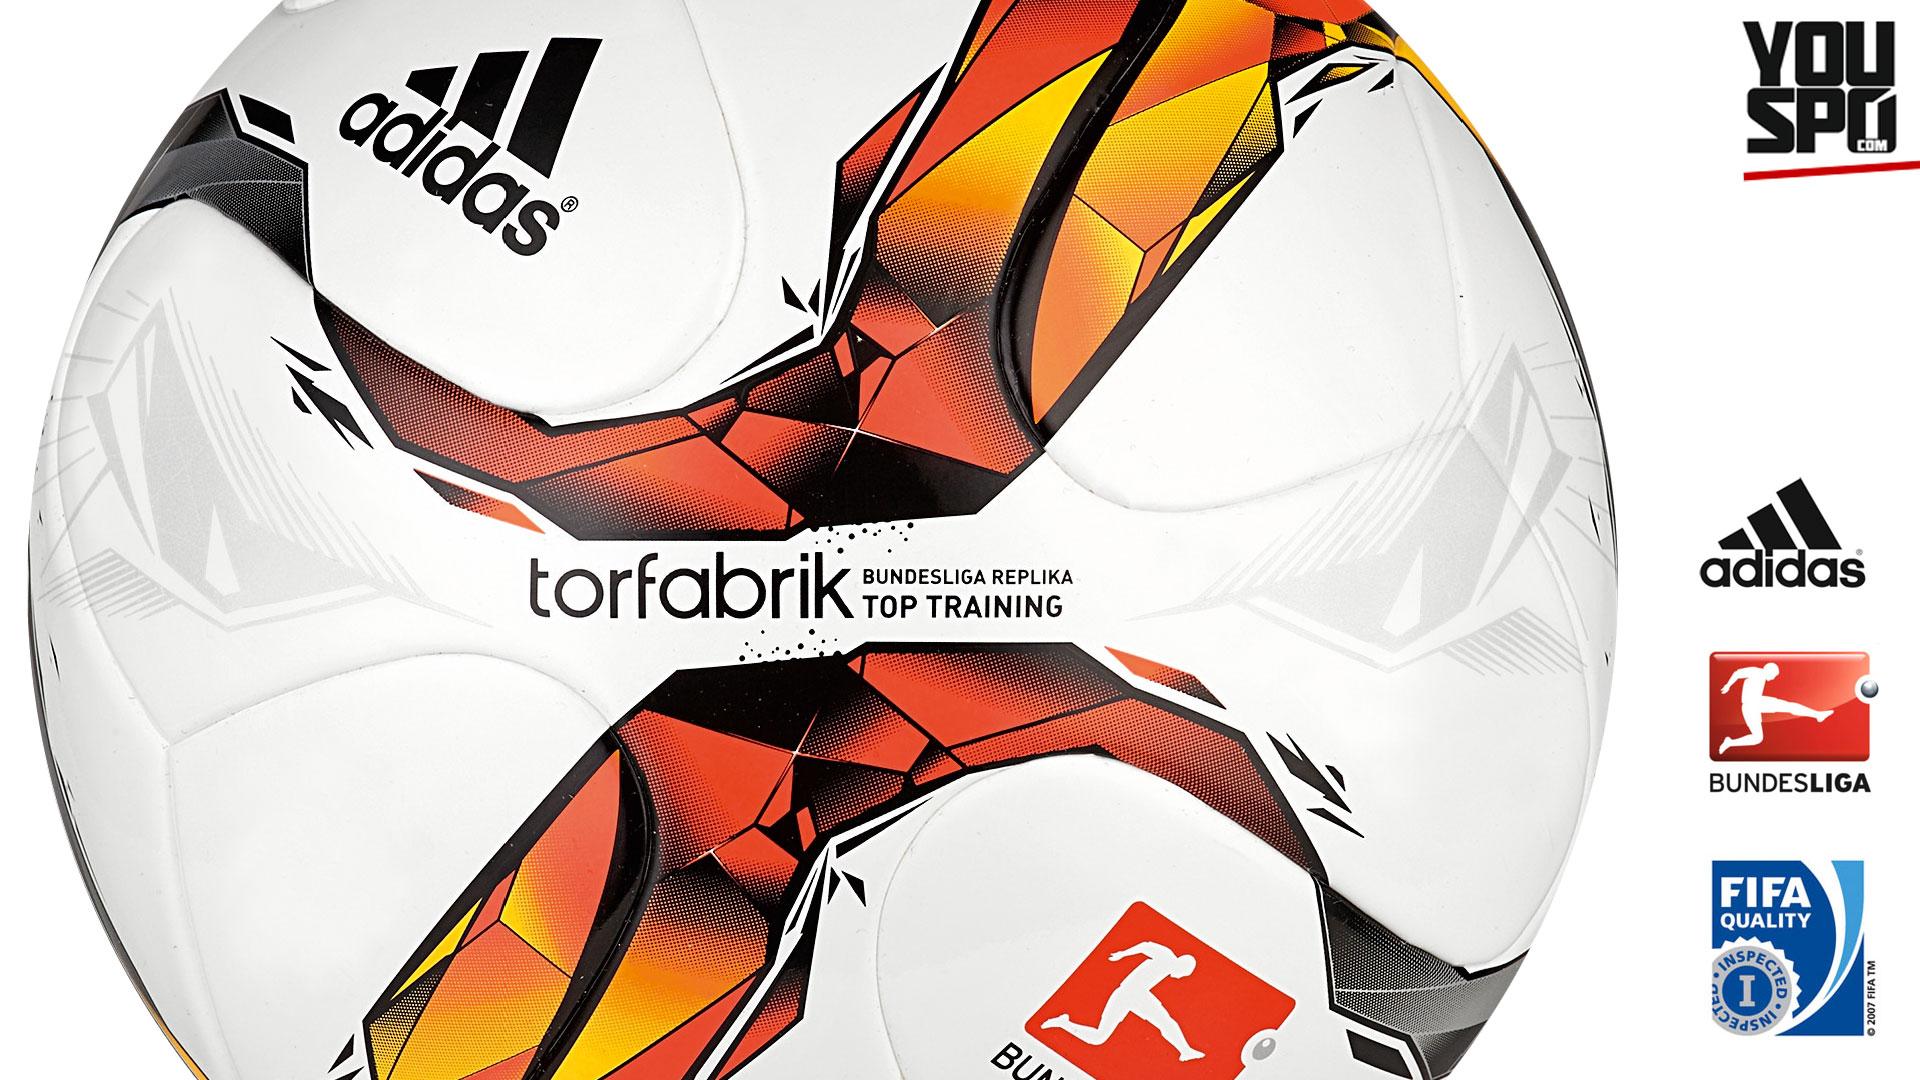 Adidas Torfarbik 15/16 Top Training (2015-2016)